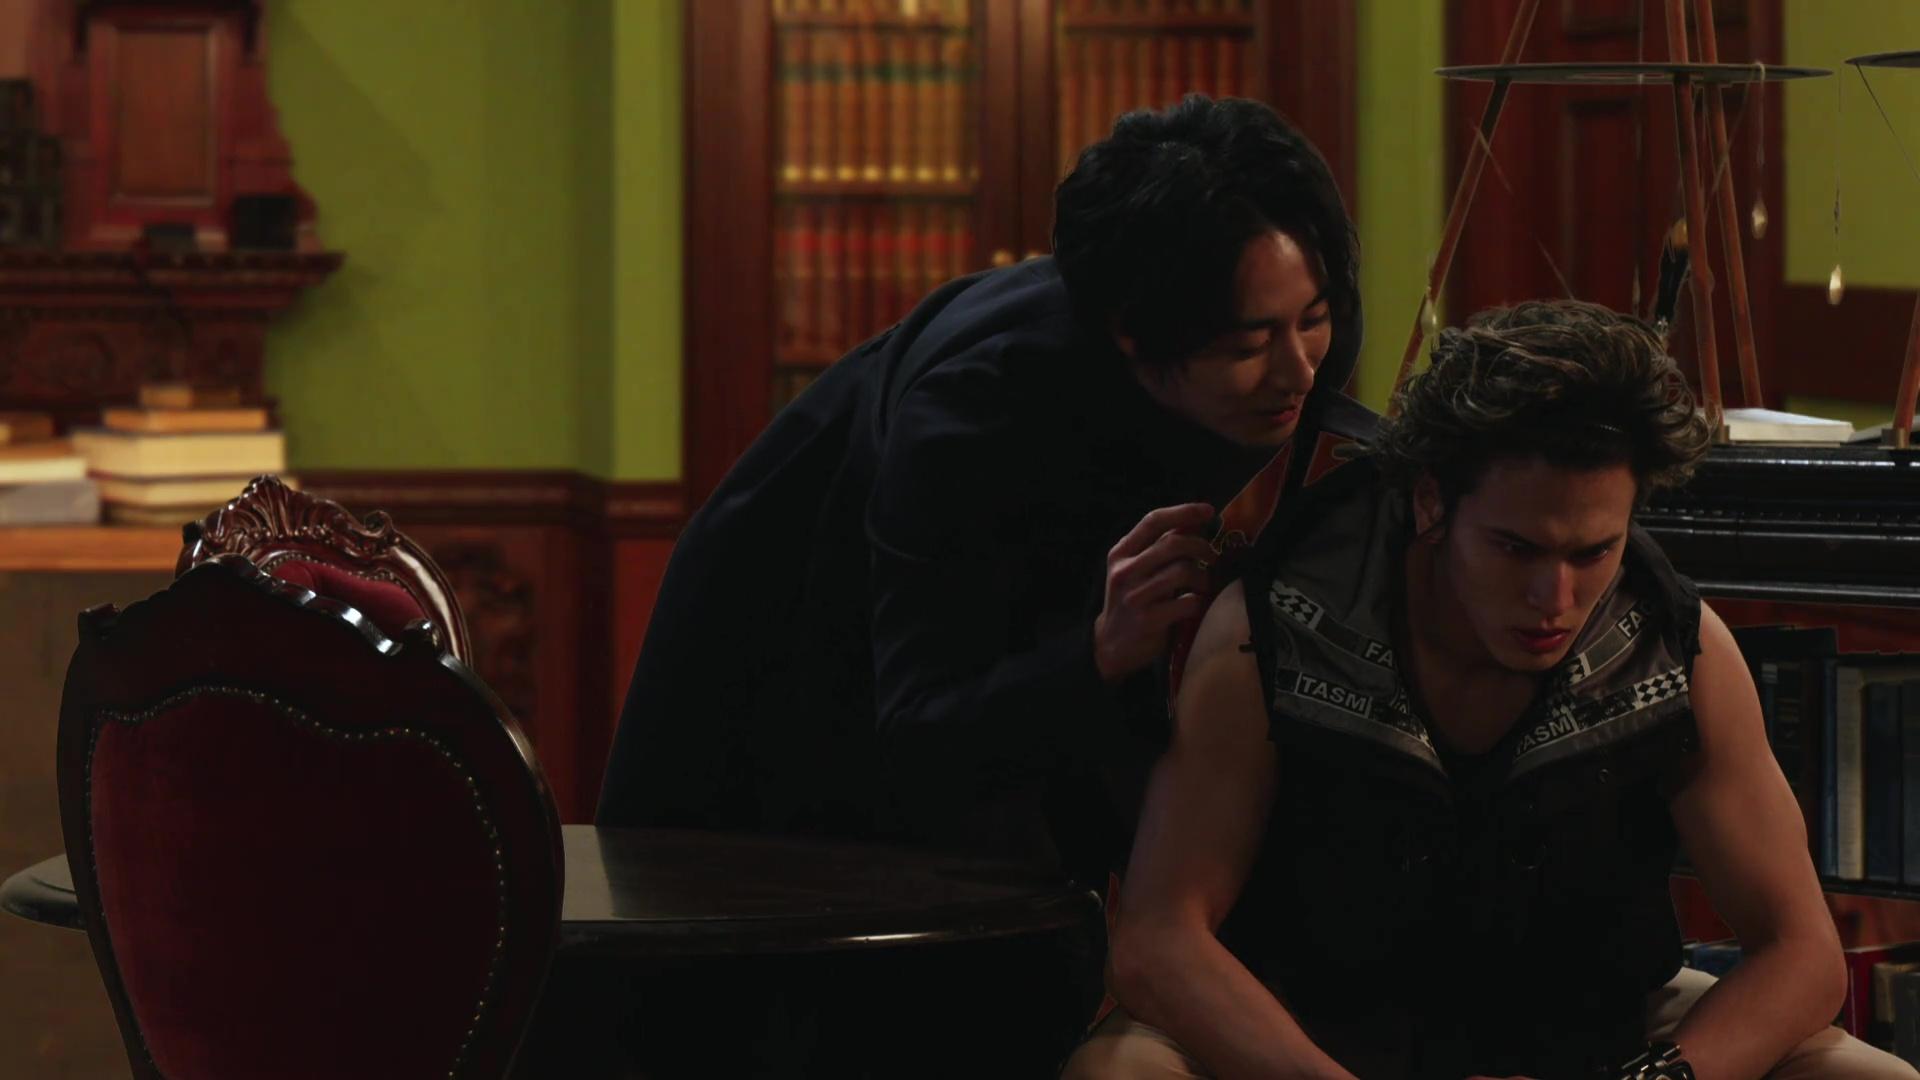 Kamen Rider Saber Episode 30 Recap